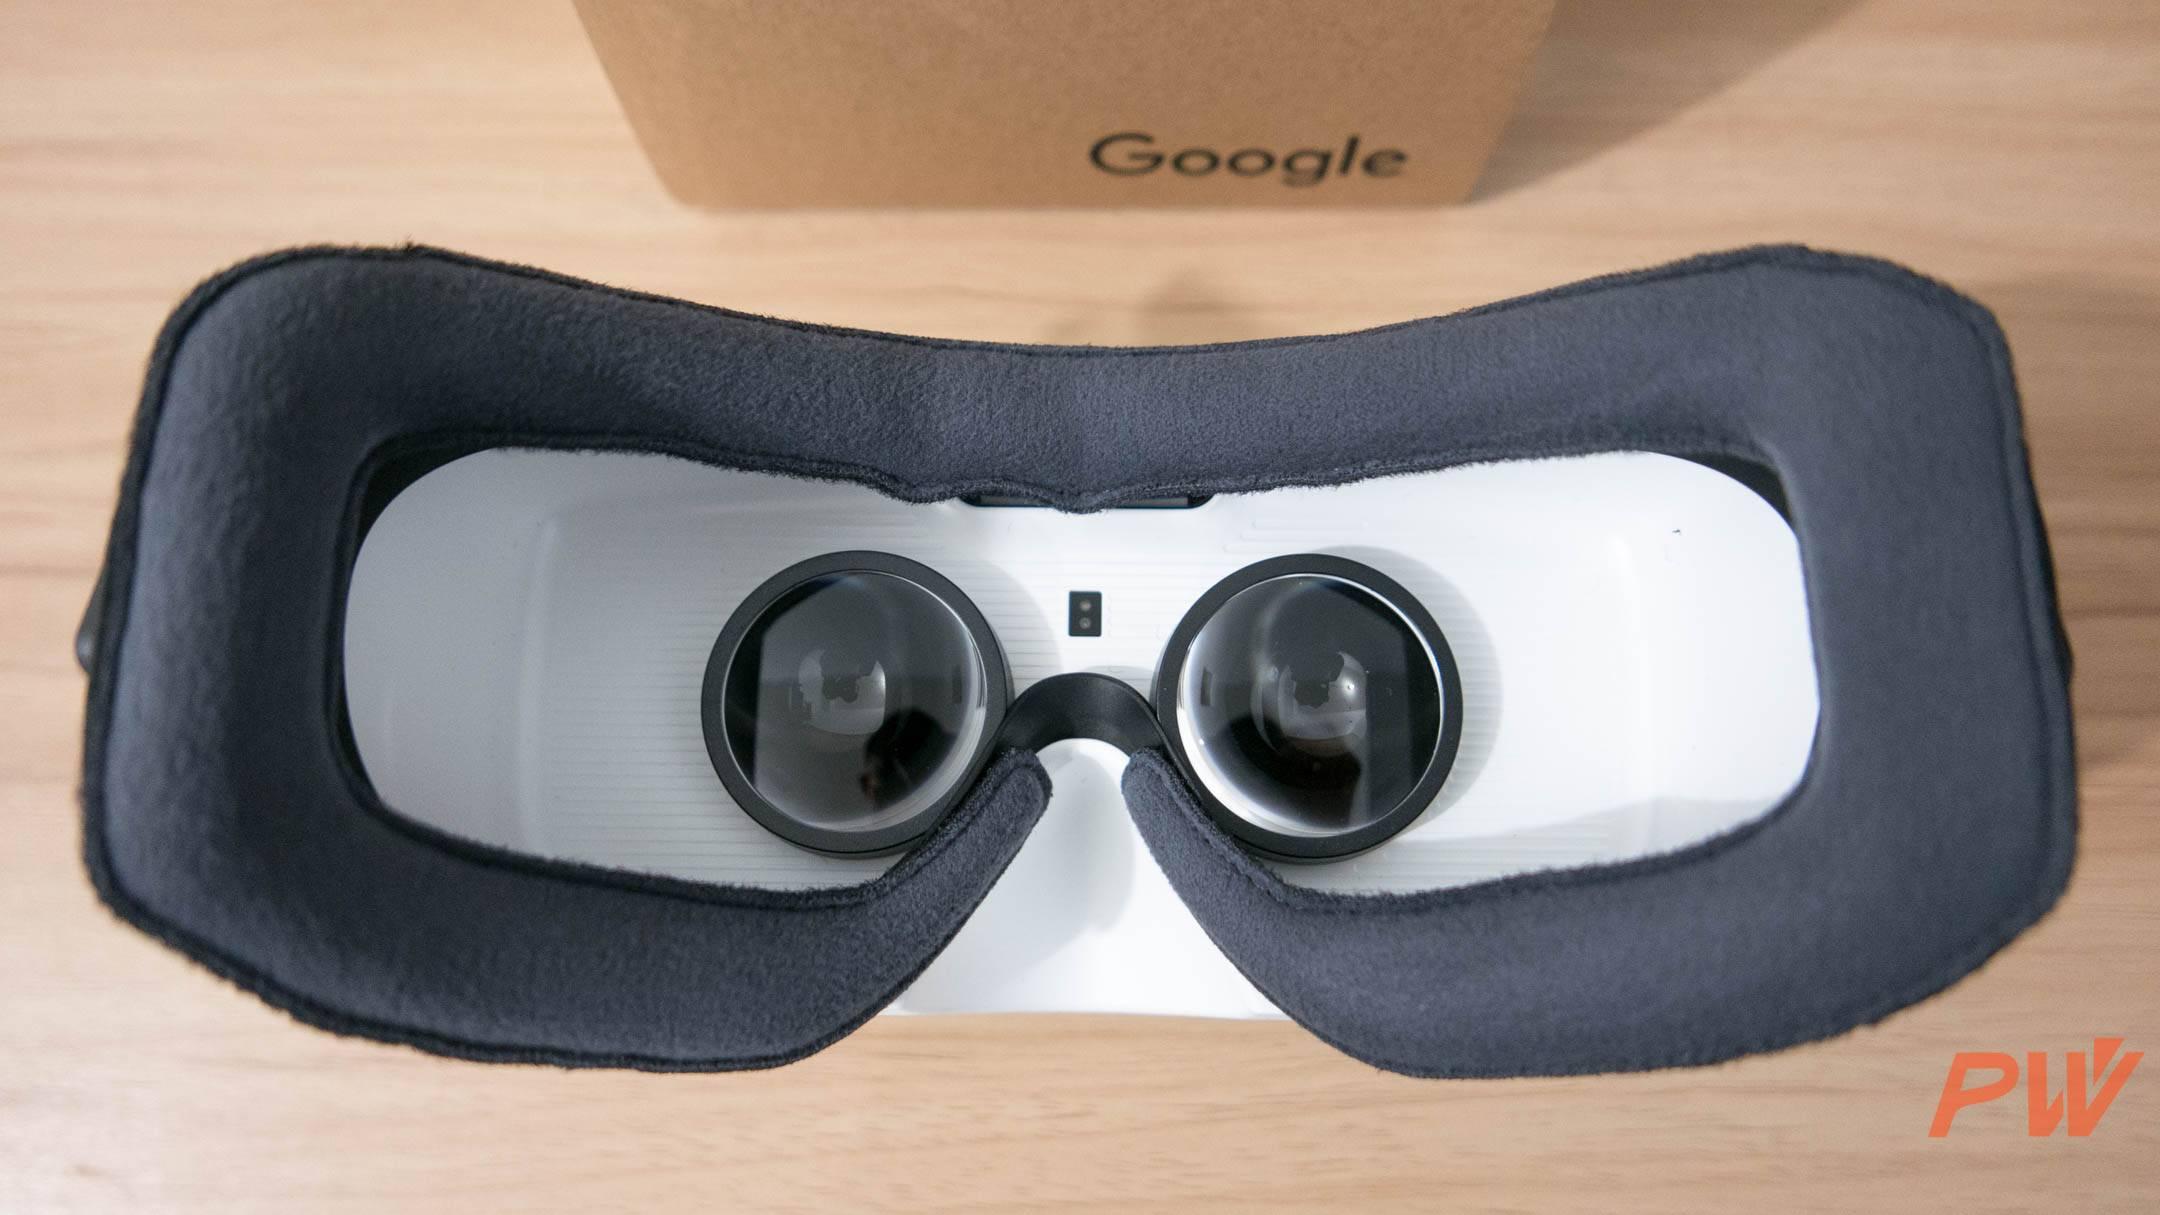 Google Cardboard Samsung Gear VR PingWest Photo By Hao Ying-3